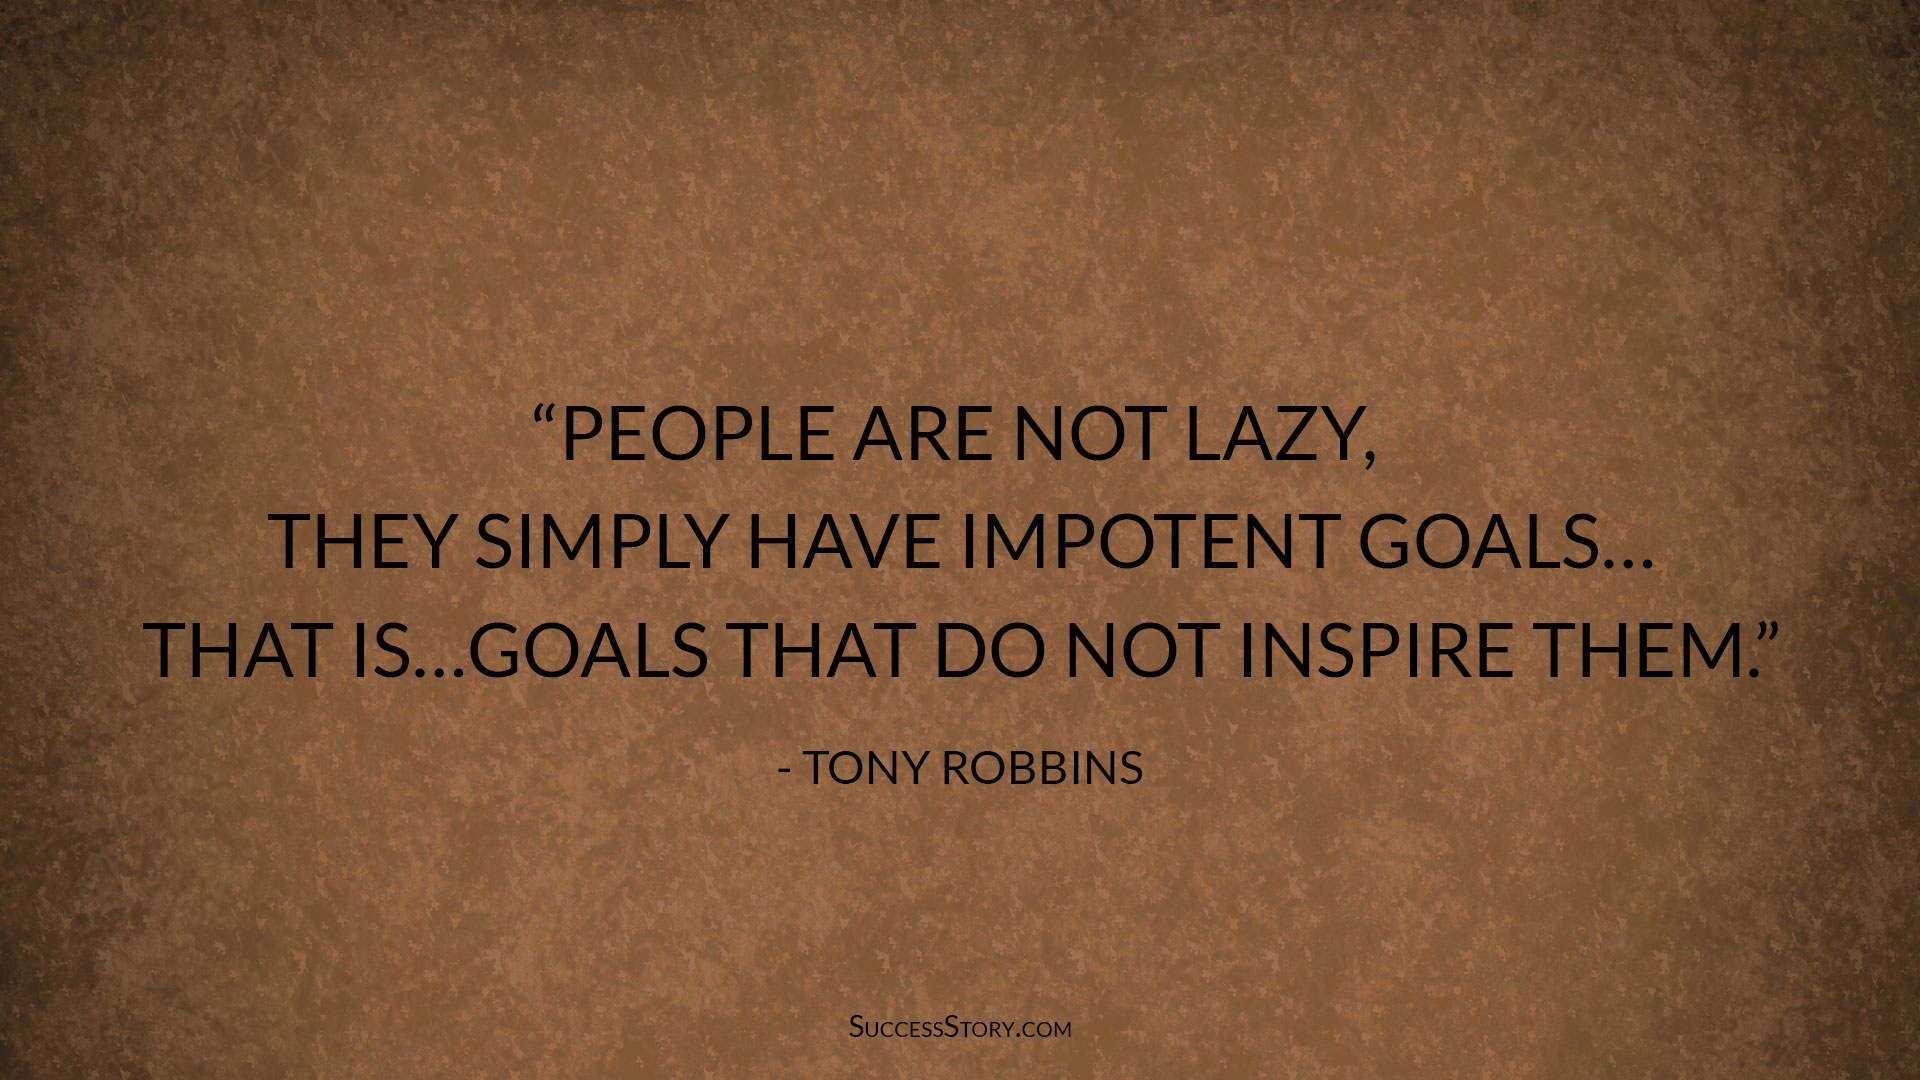 tony robbins goal setting quote